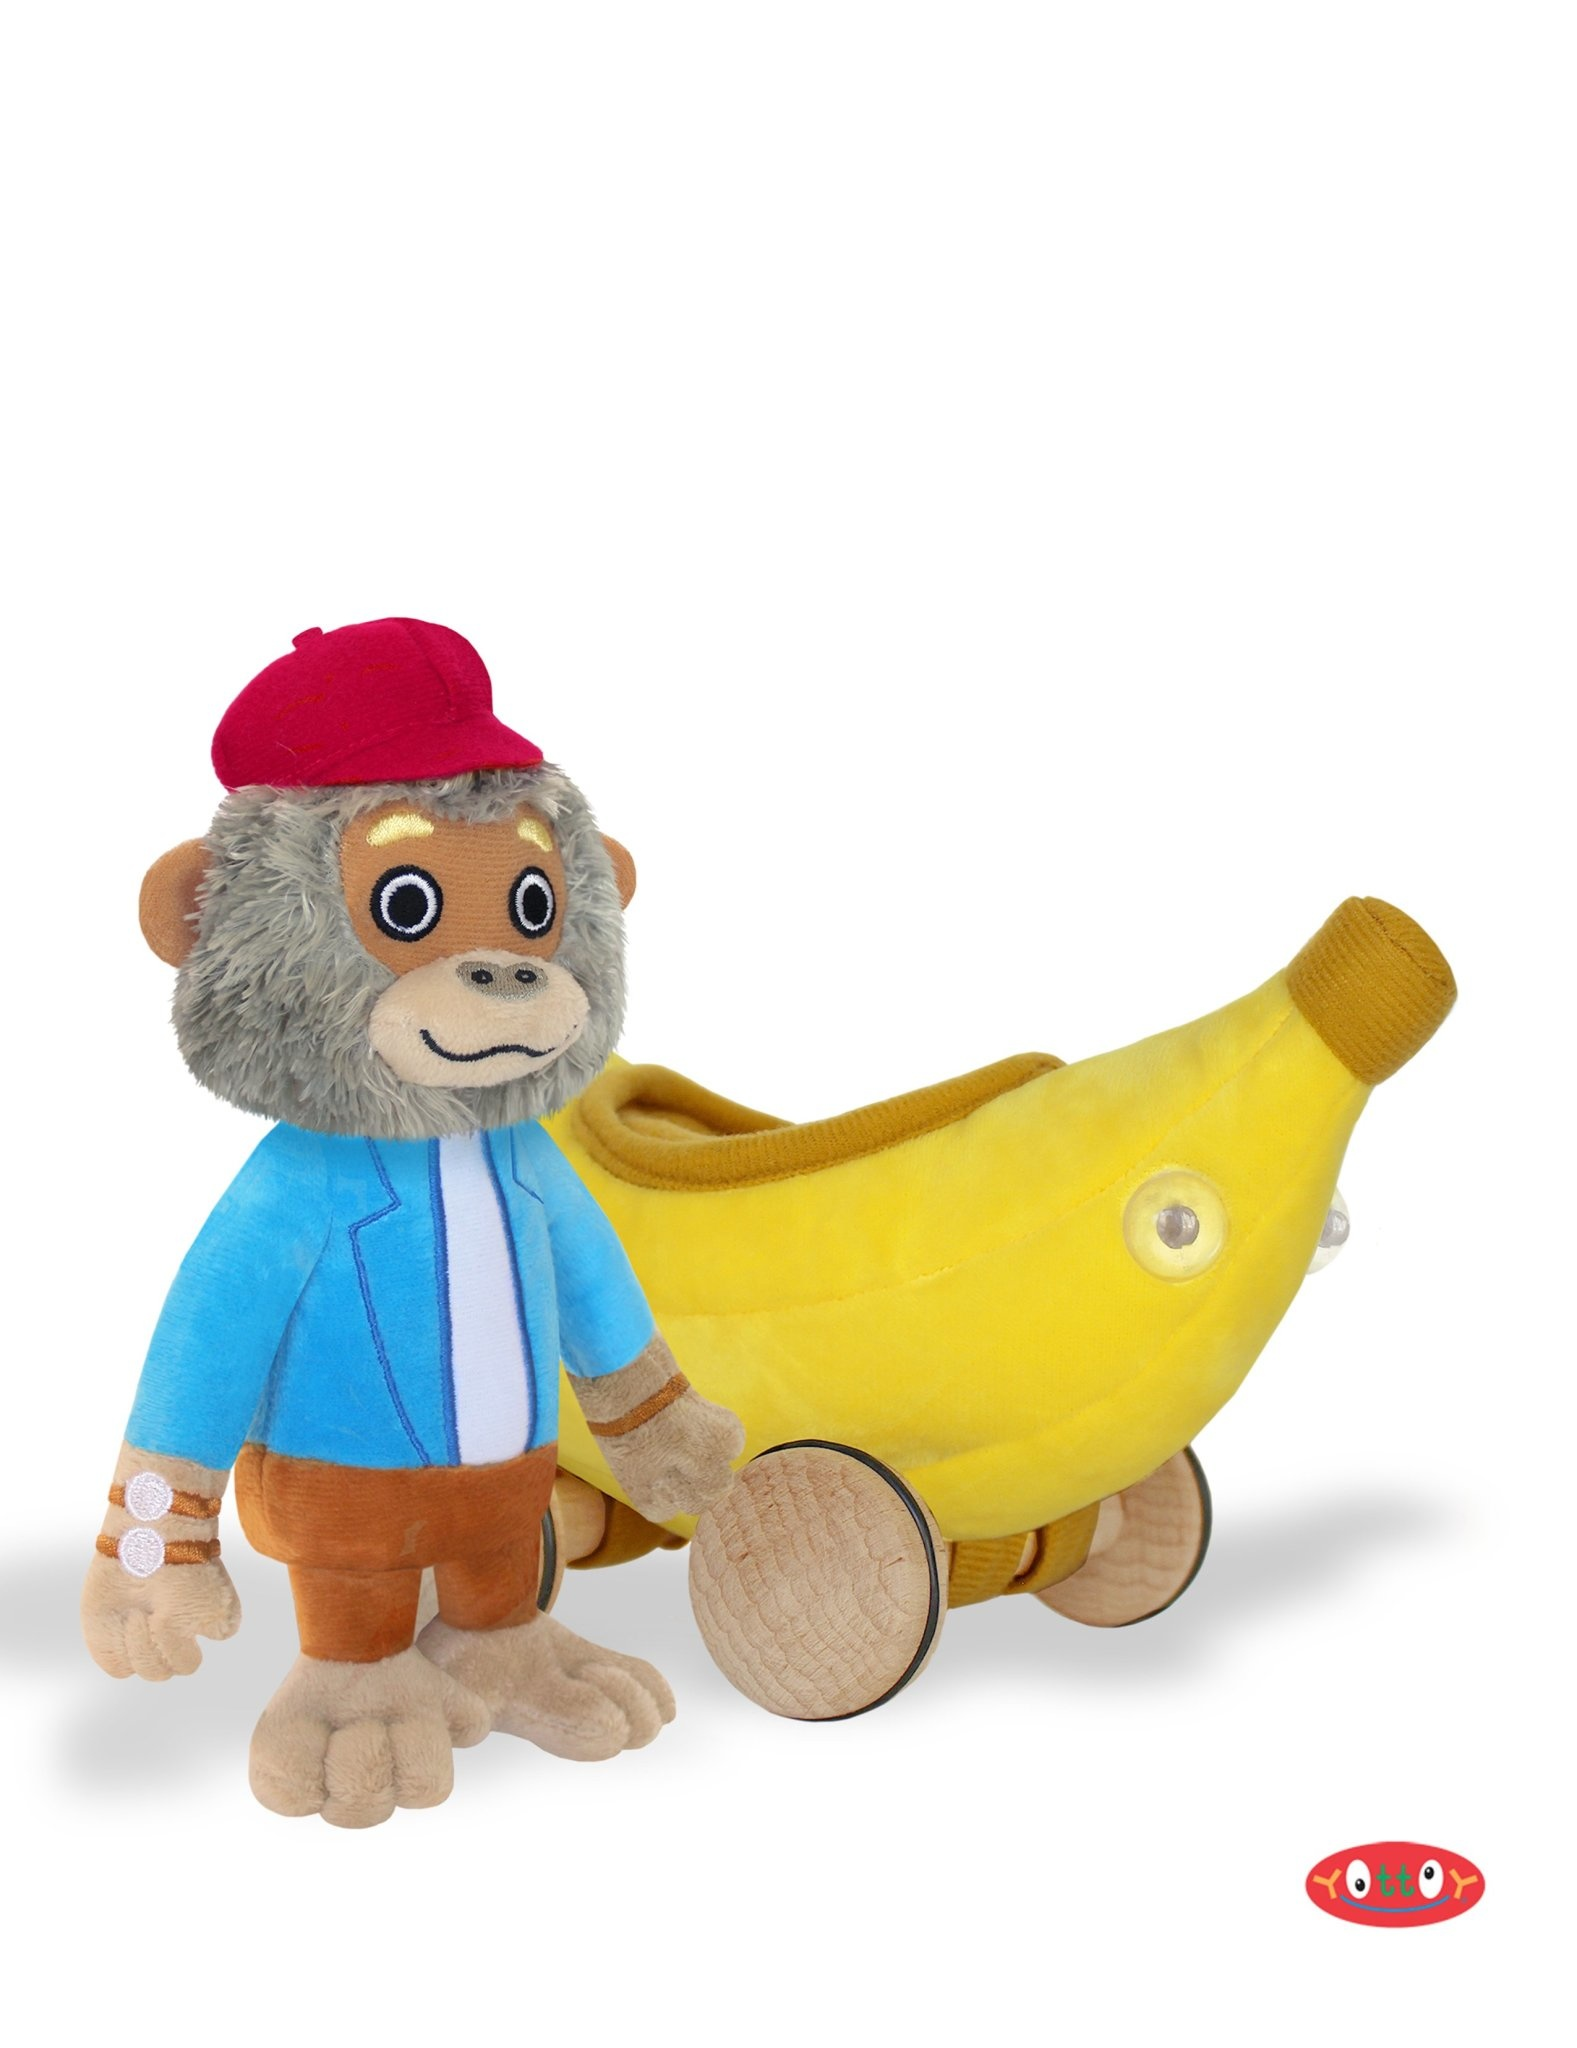 Bananas Gorilla Soft Toy with Bananamobile